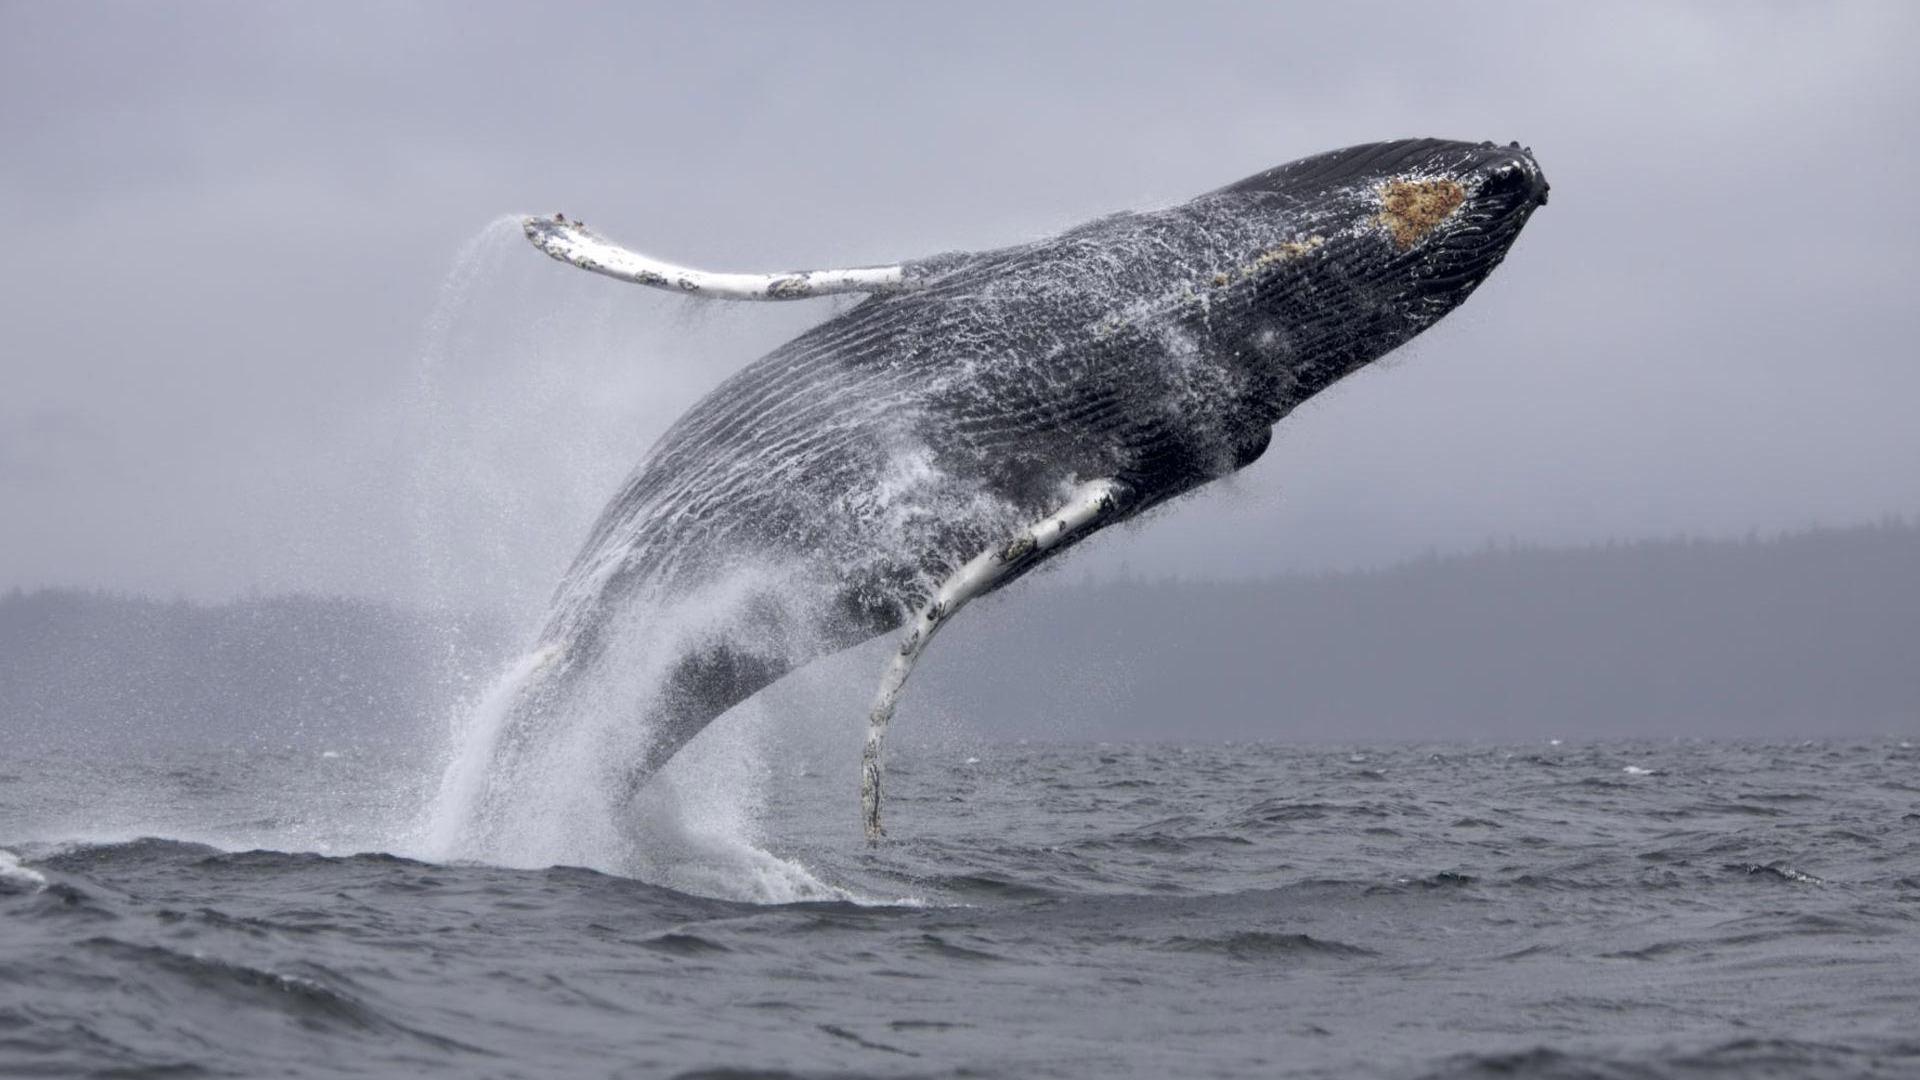 Humpback whale wallpaper 1920x1080